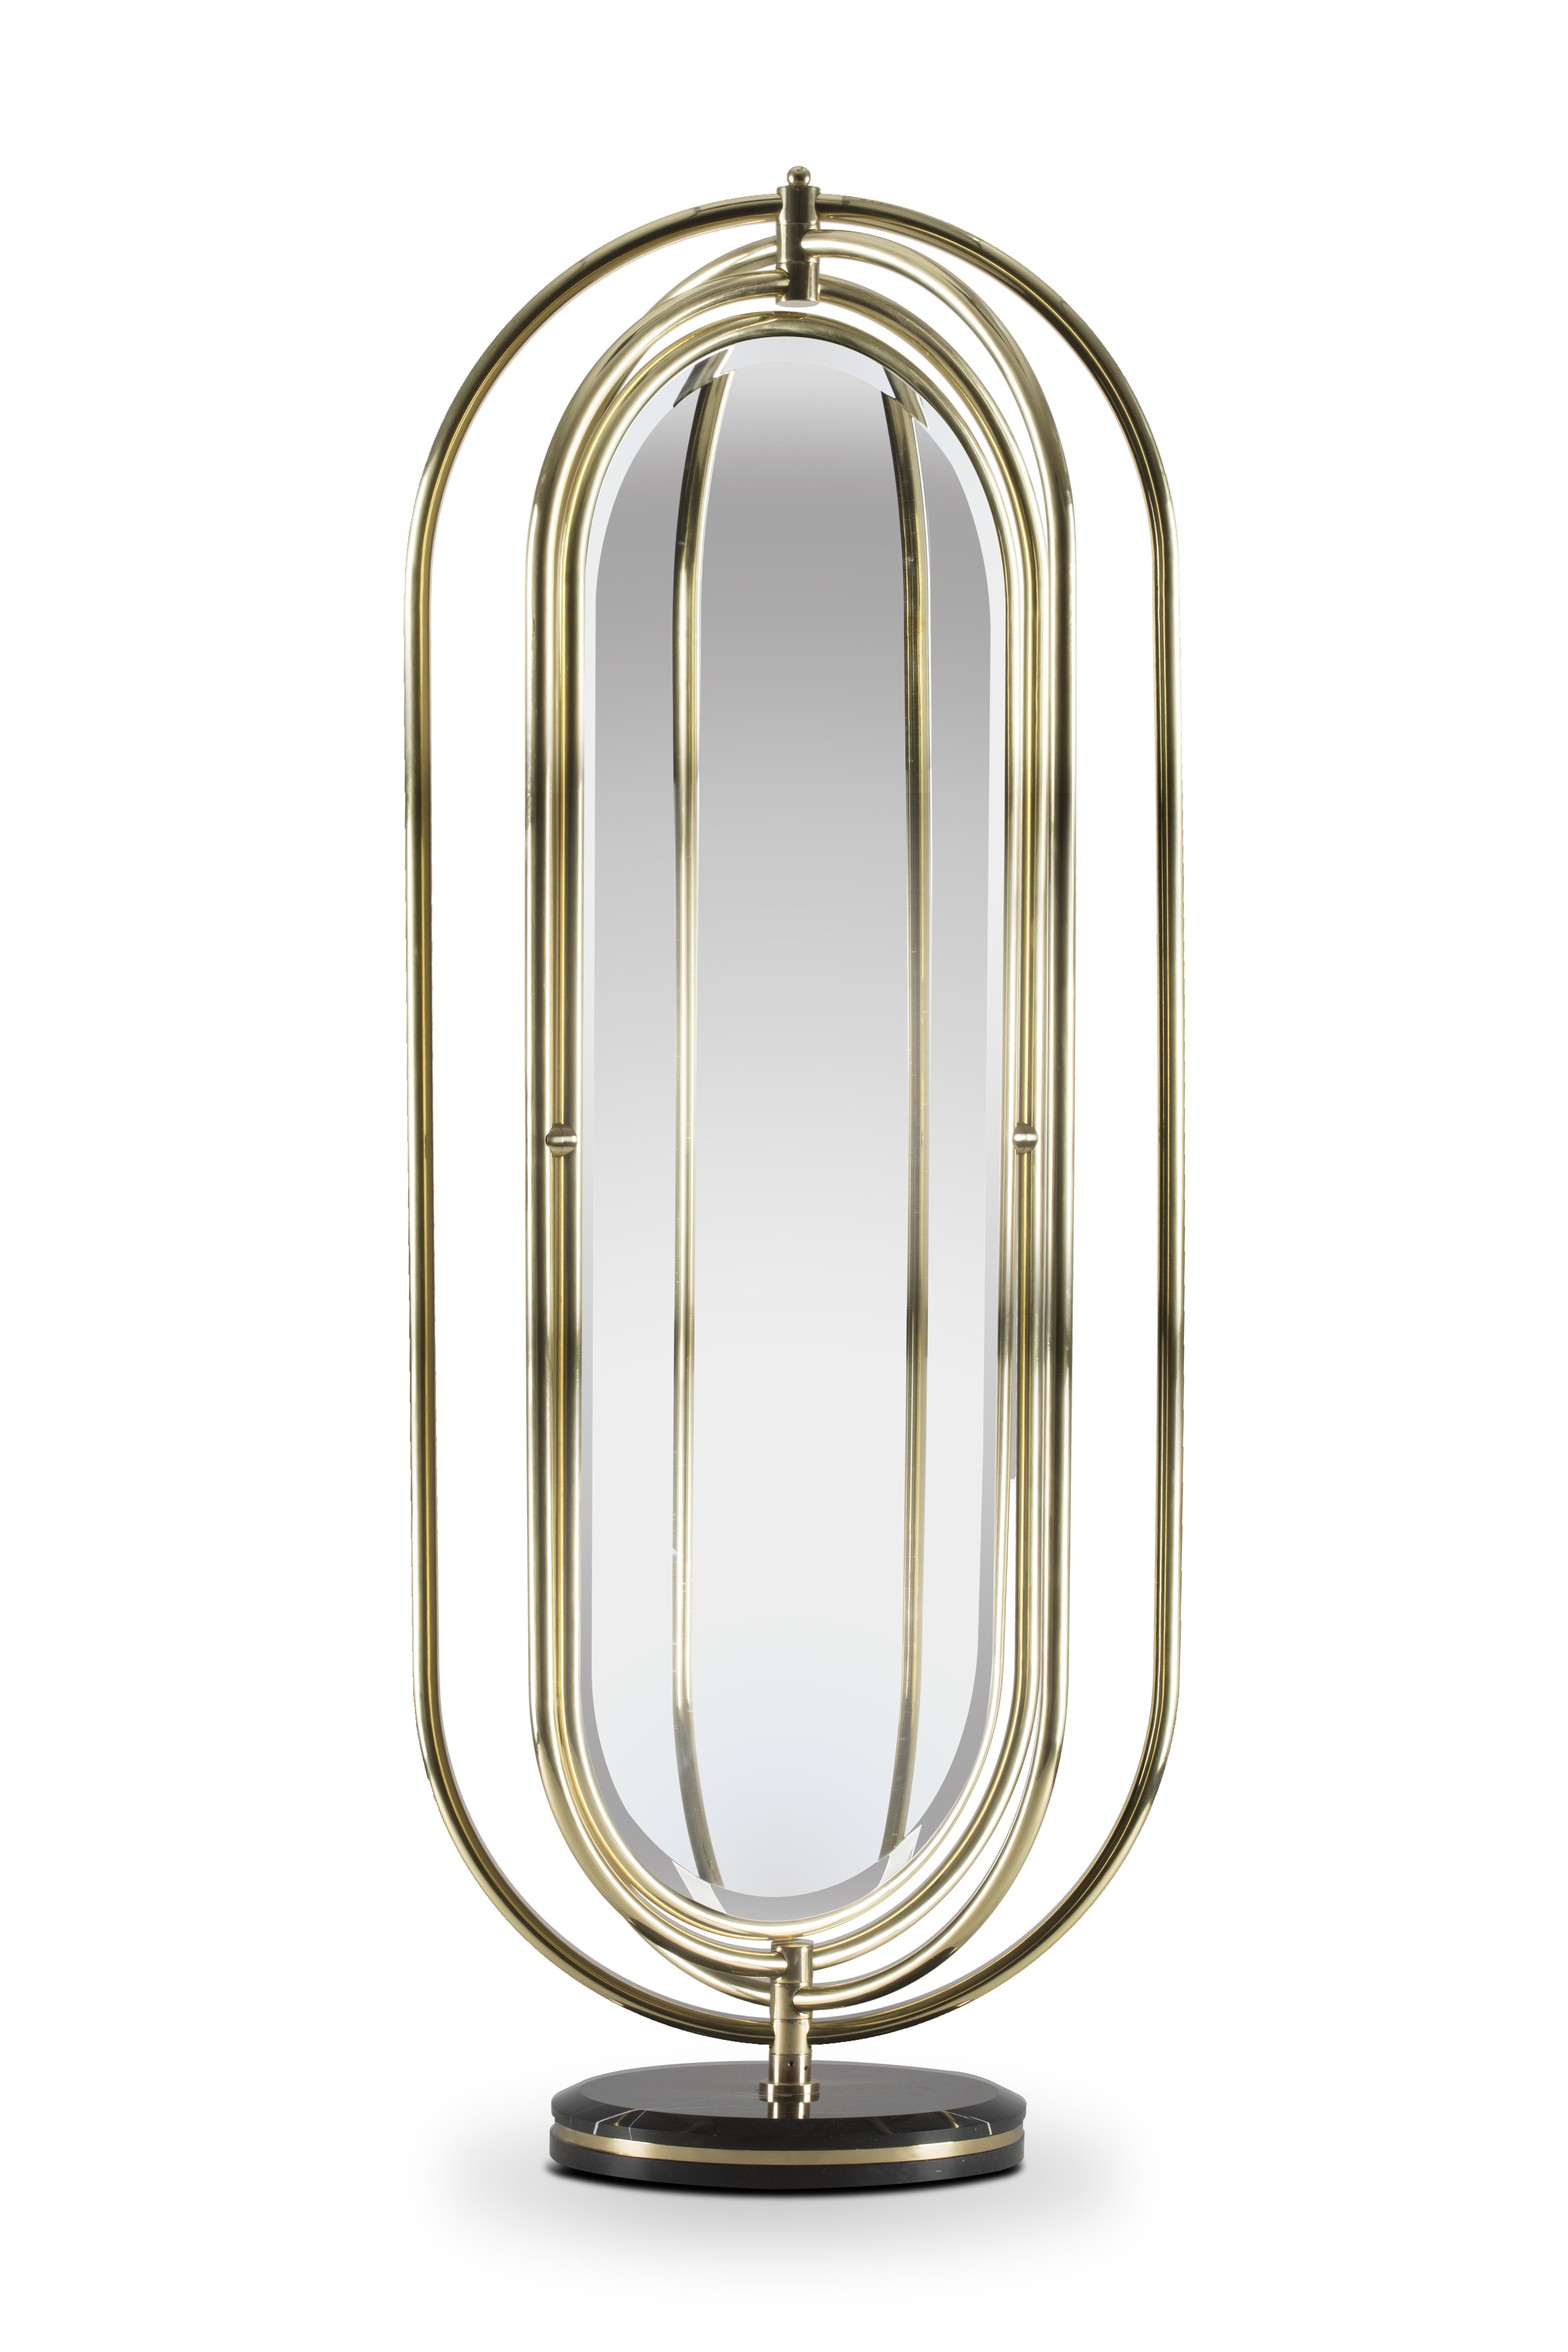 colosseum-floor-mirror-2-hr